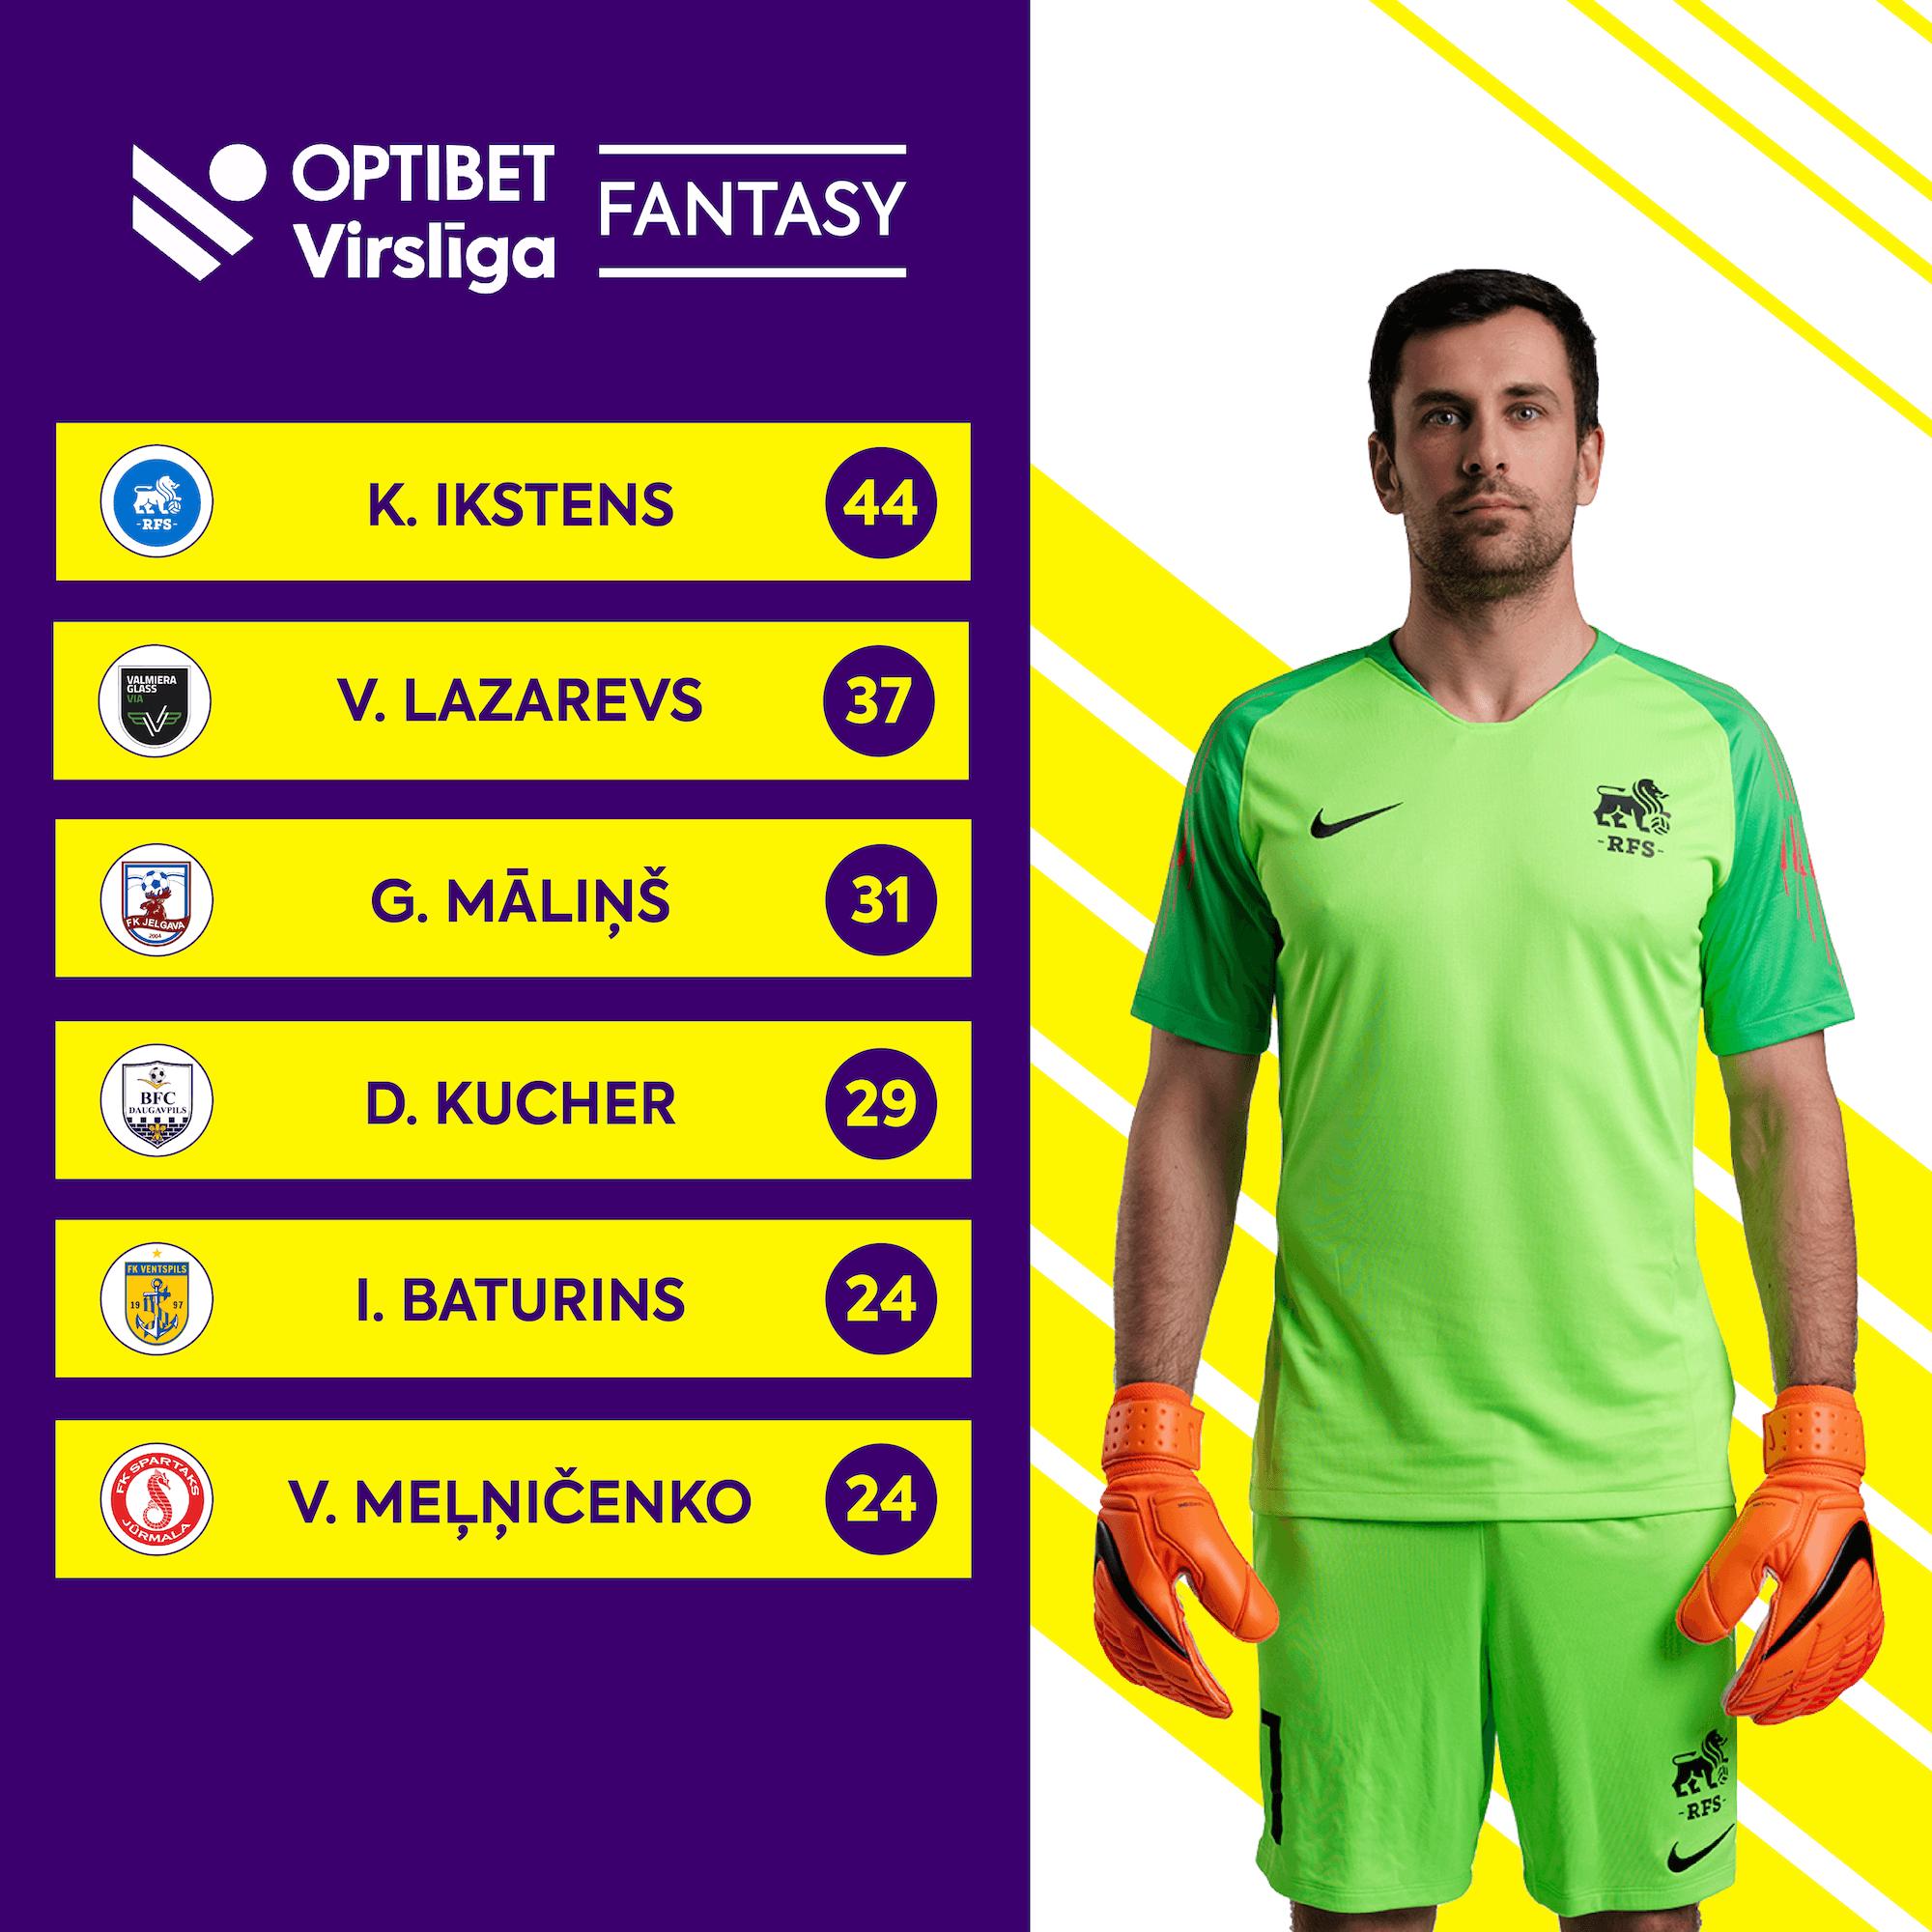 Fantasy Virsliga Best Goalkeeper